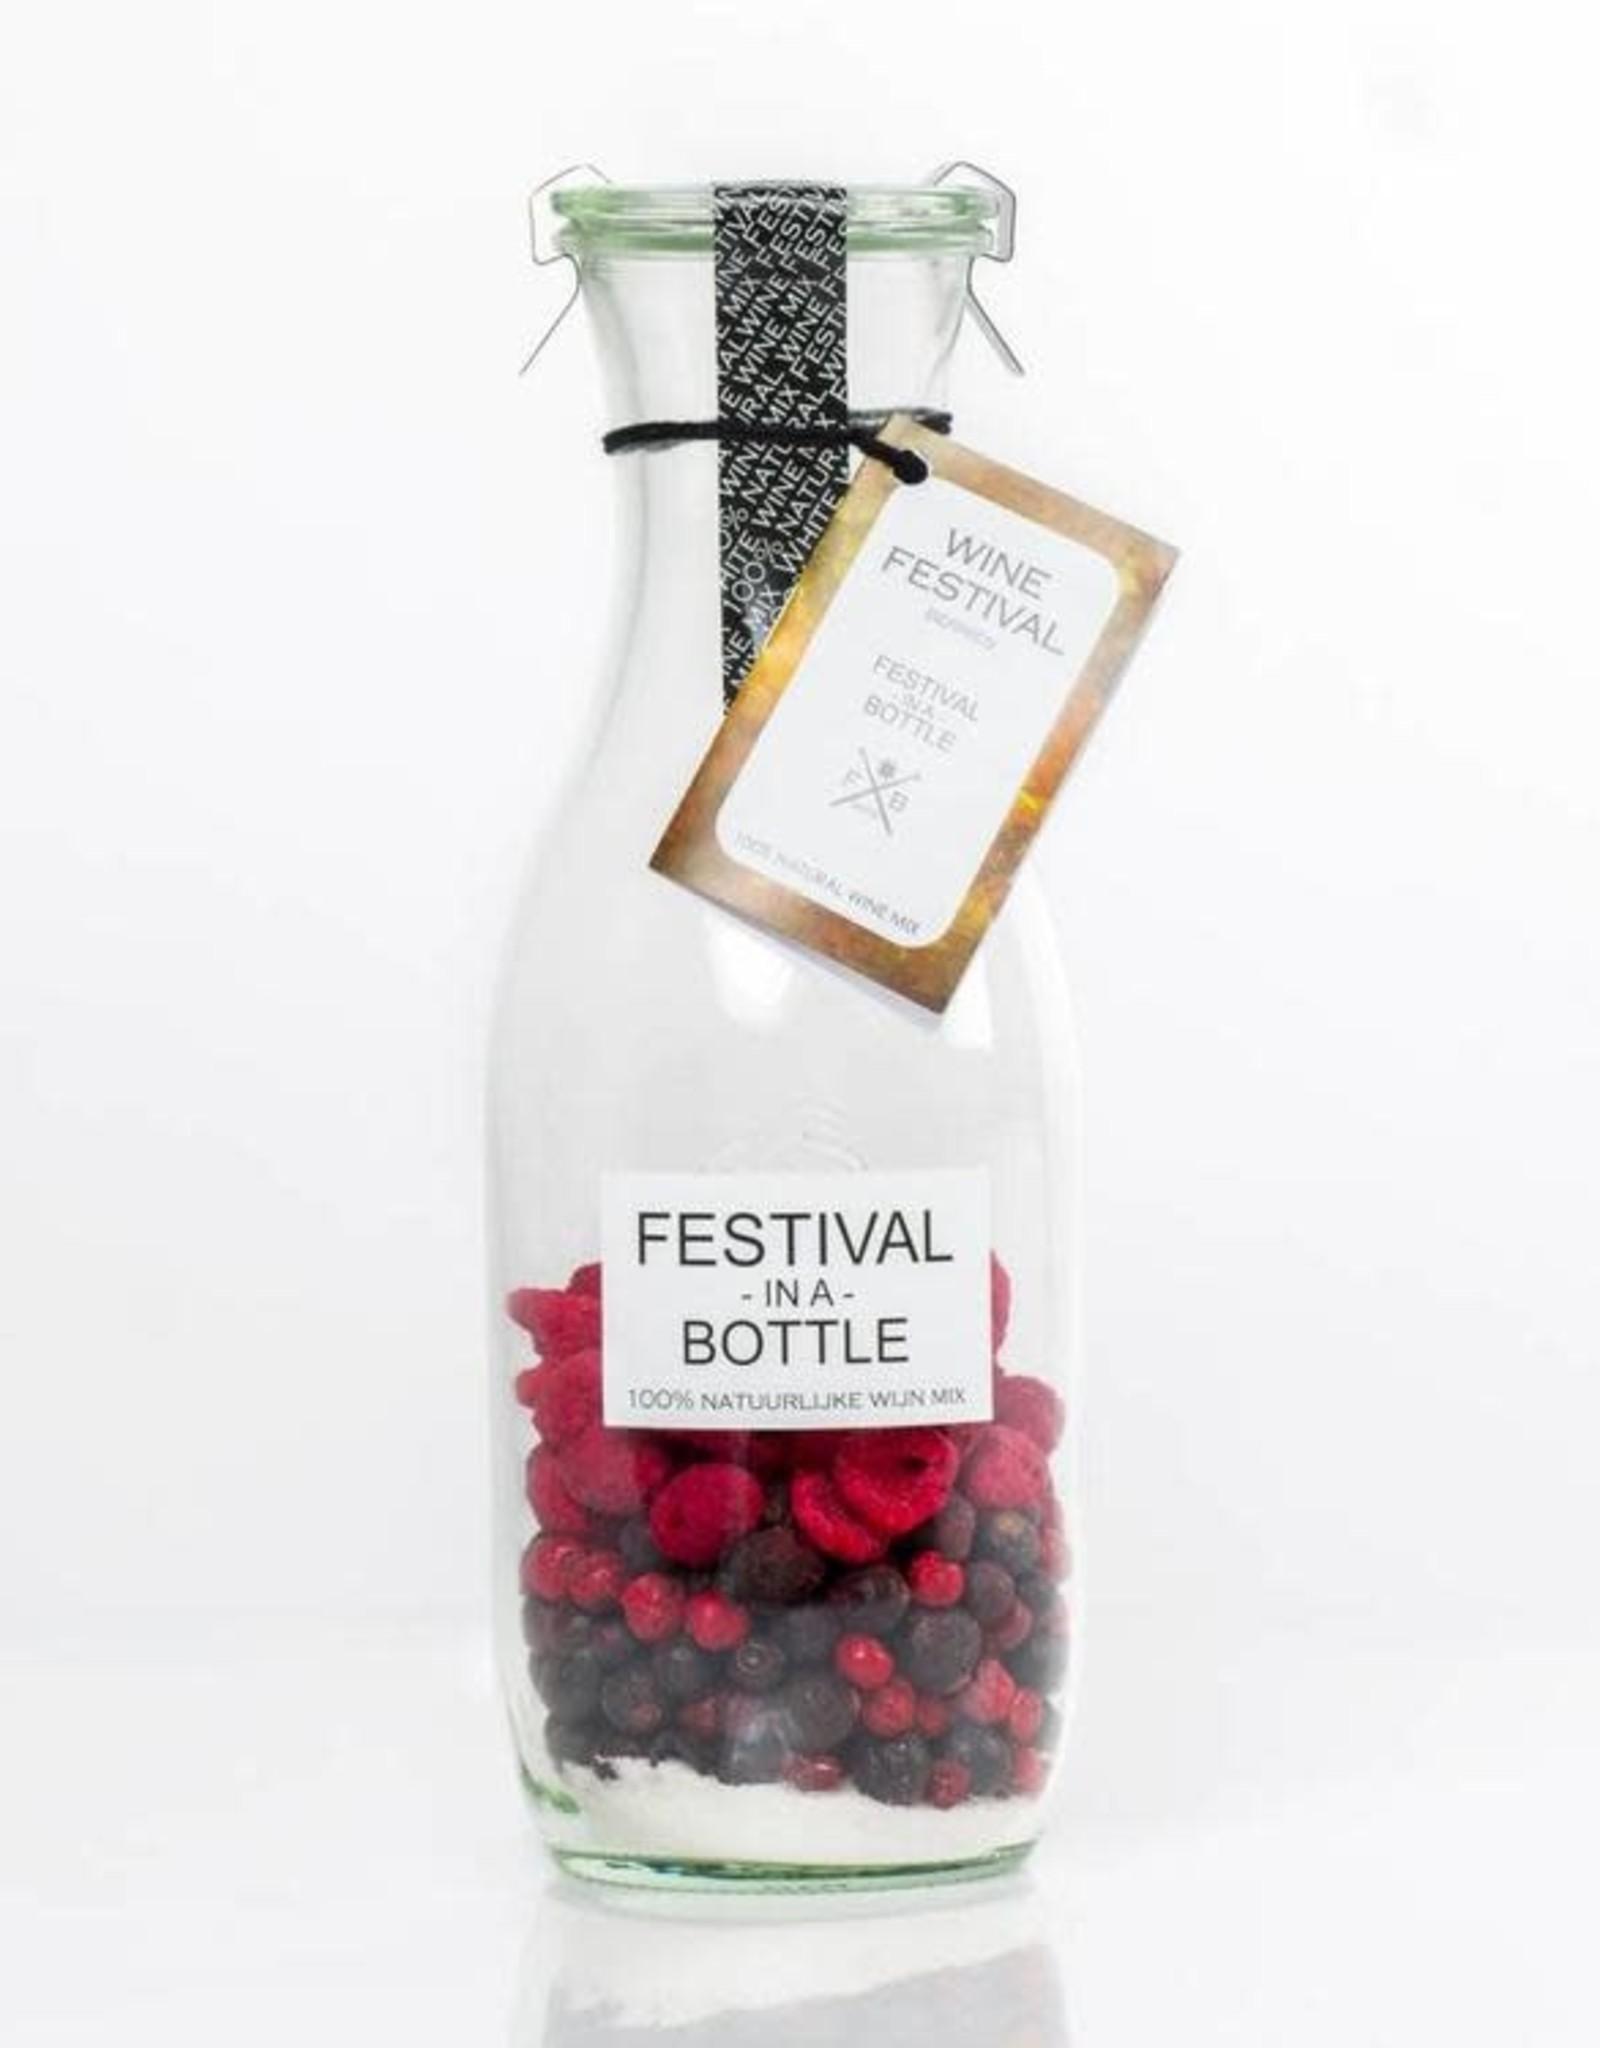 Festival in a bottle festival in a bottle wine berries